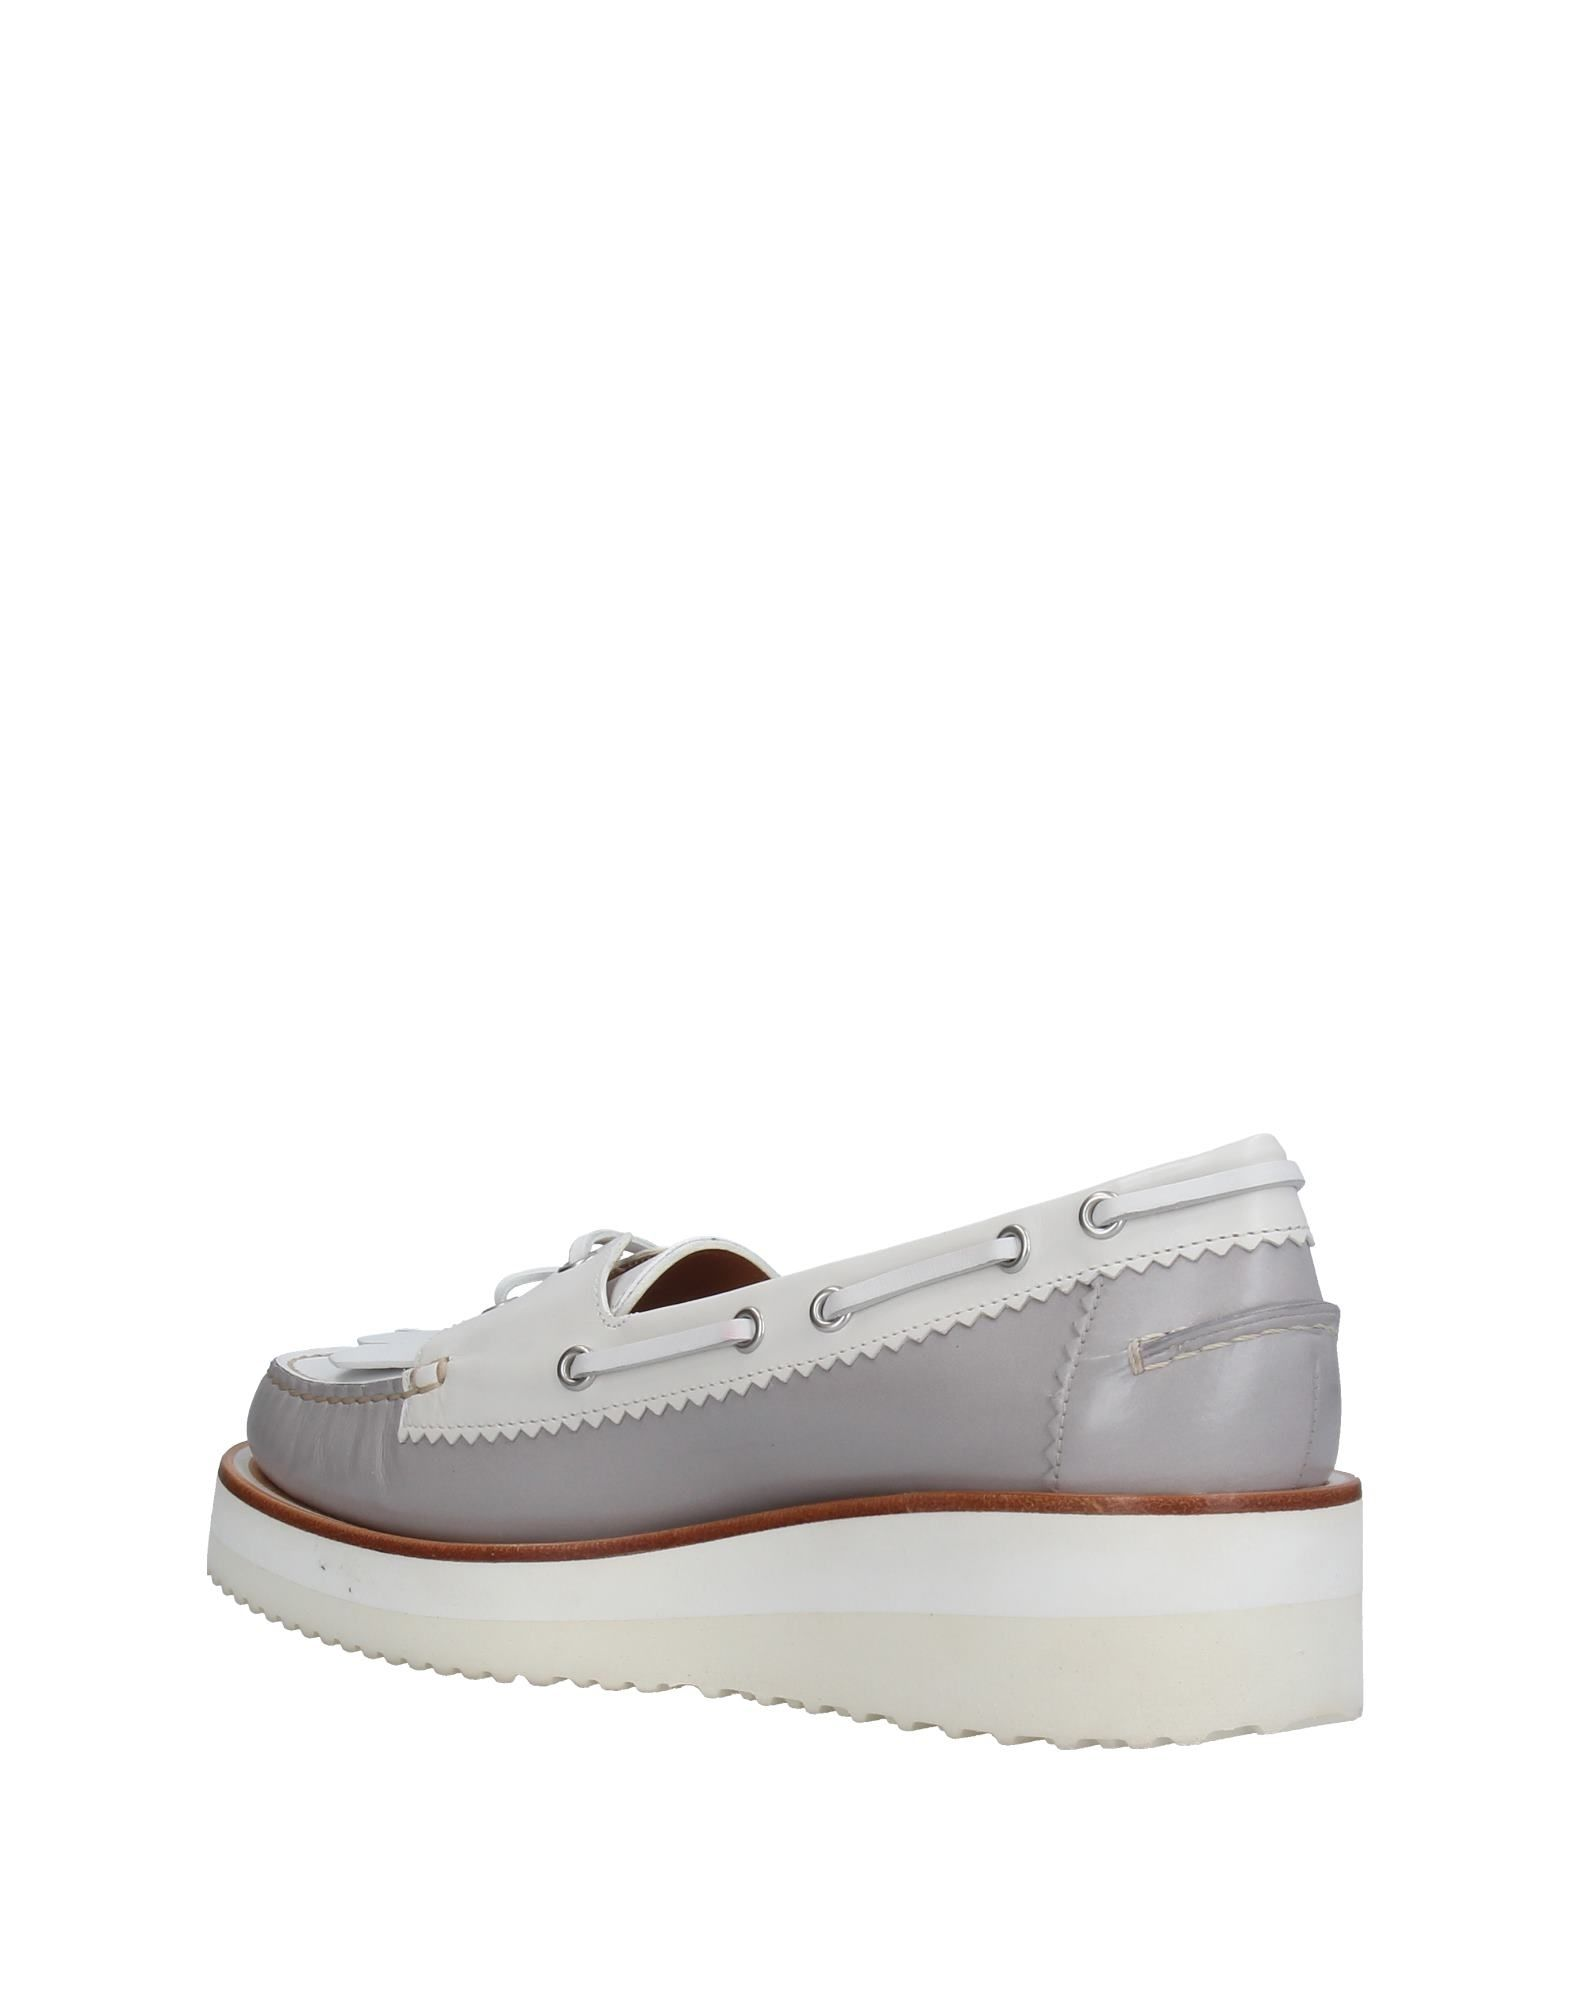 Haltbare Mode Santoni billige Schuhe Santoni Mode Mokassins Damen  11262657XI Heiße Schuhe cc23ff